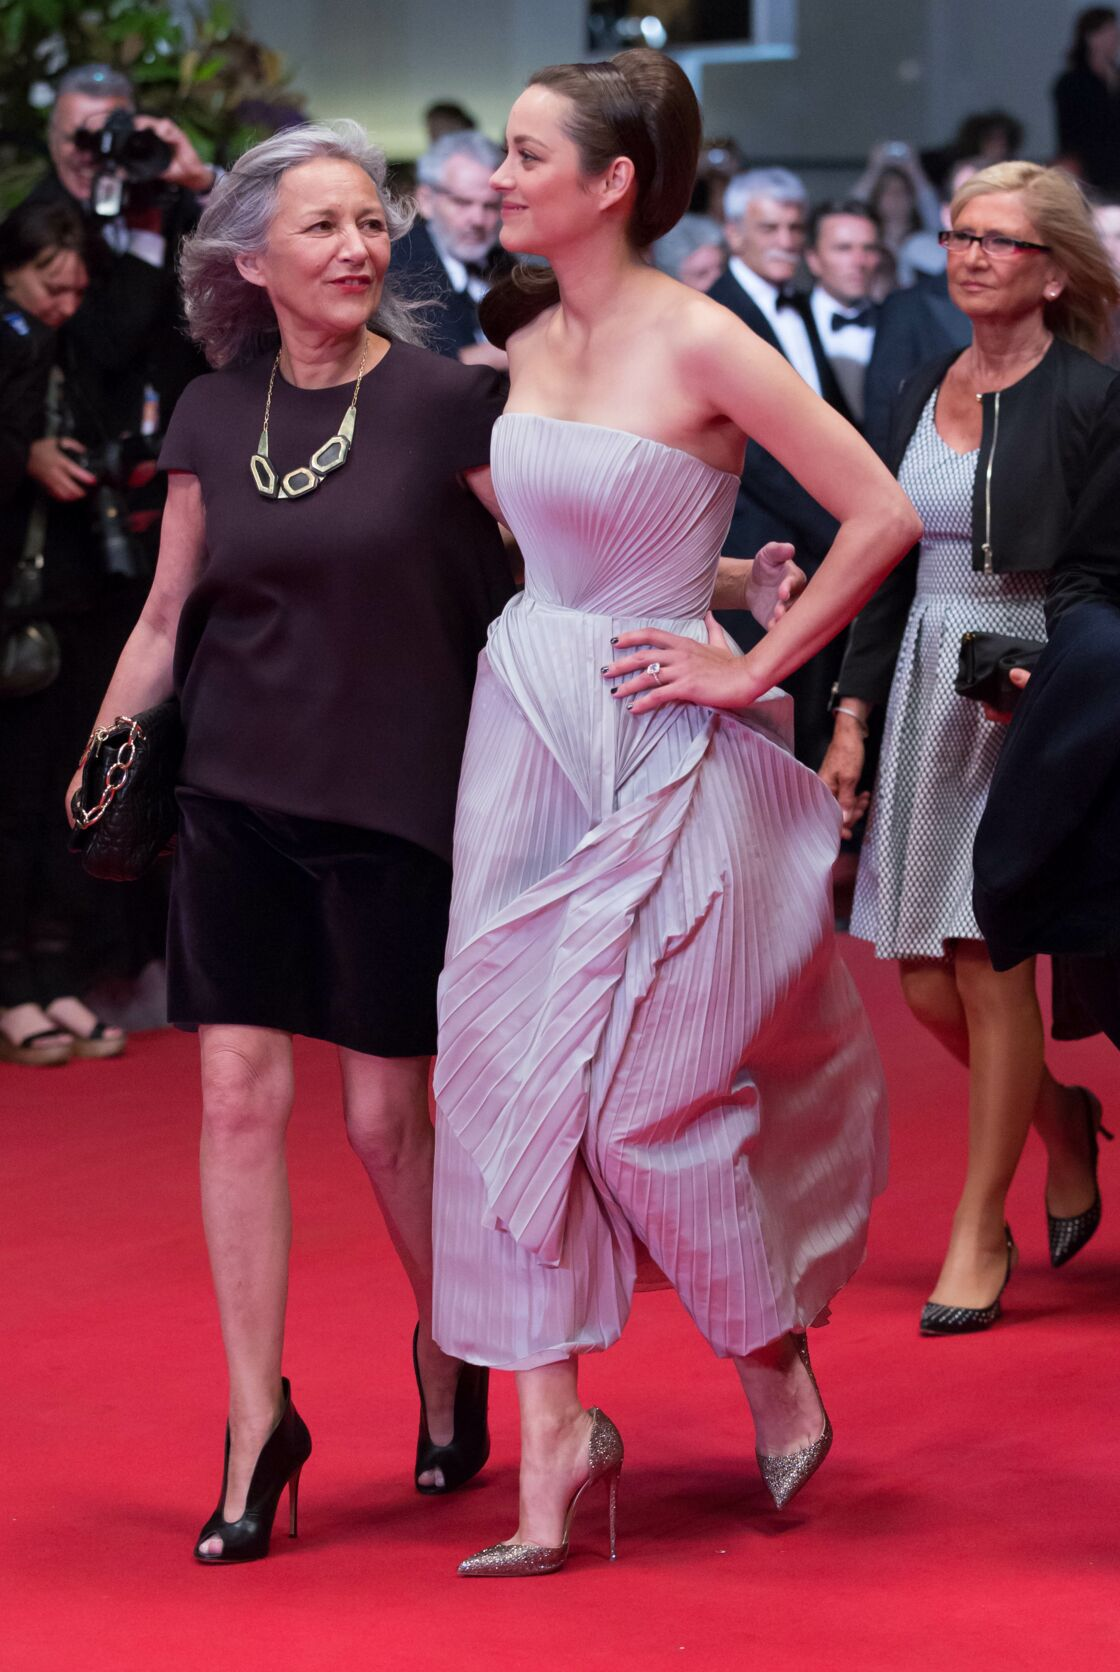 Marion Cotillard accompagnée de sa maman, Niseema Theillaud au Festival de Cannes 2014